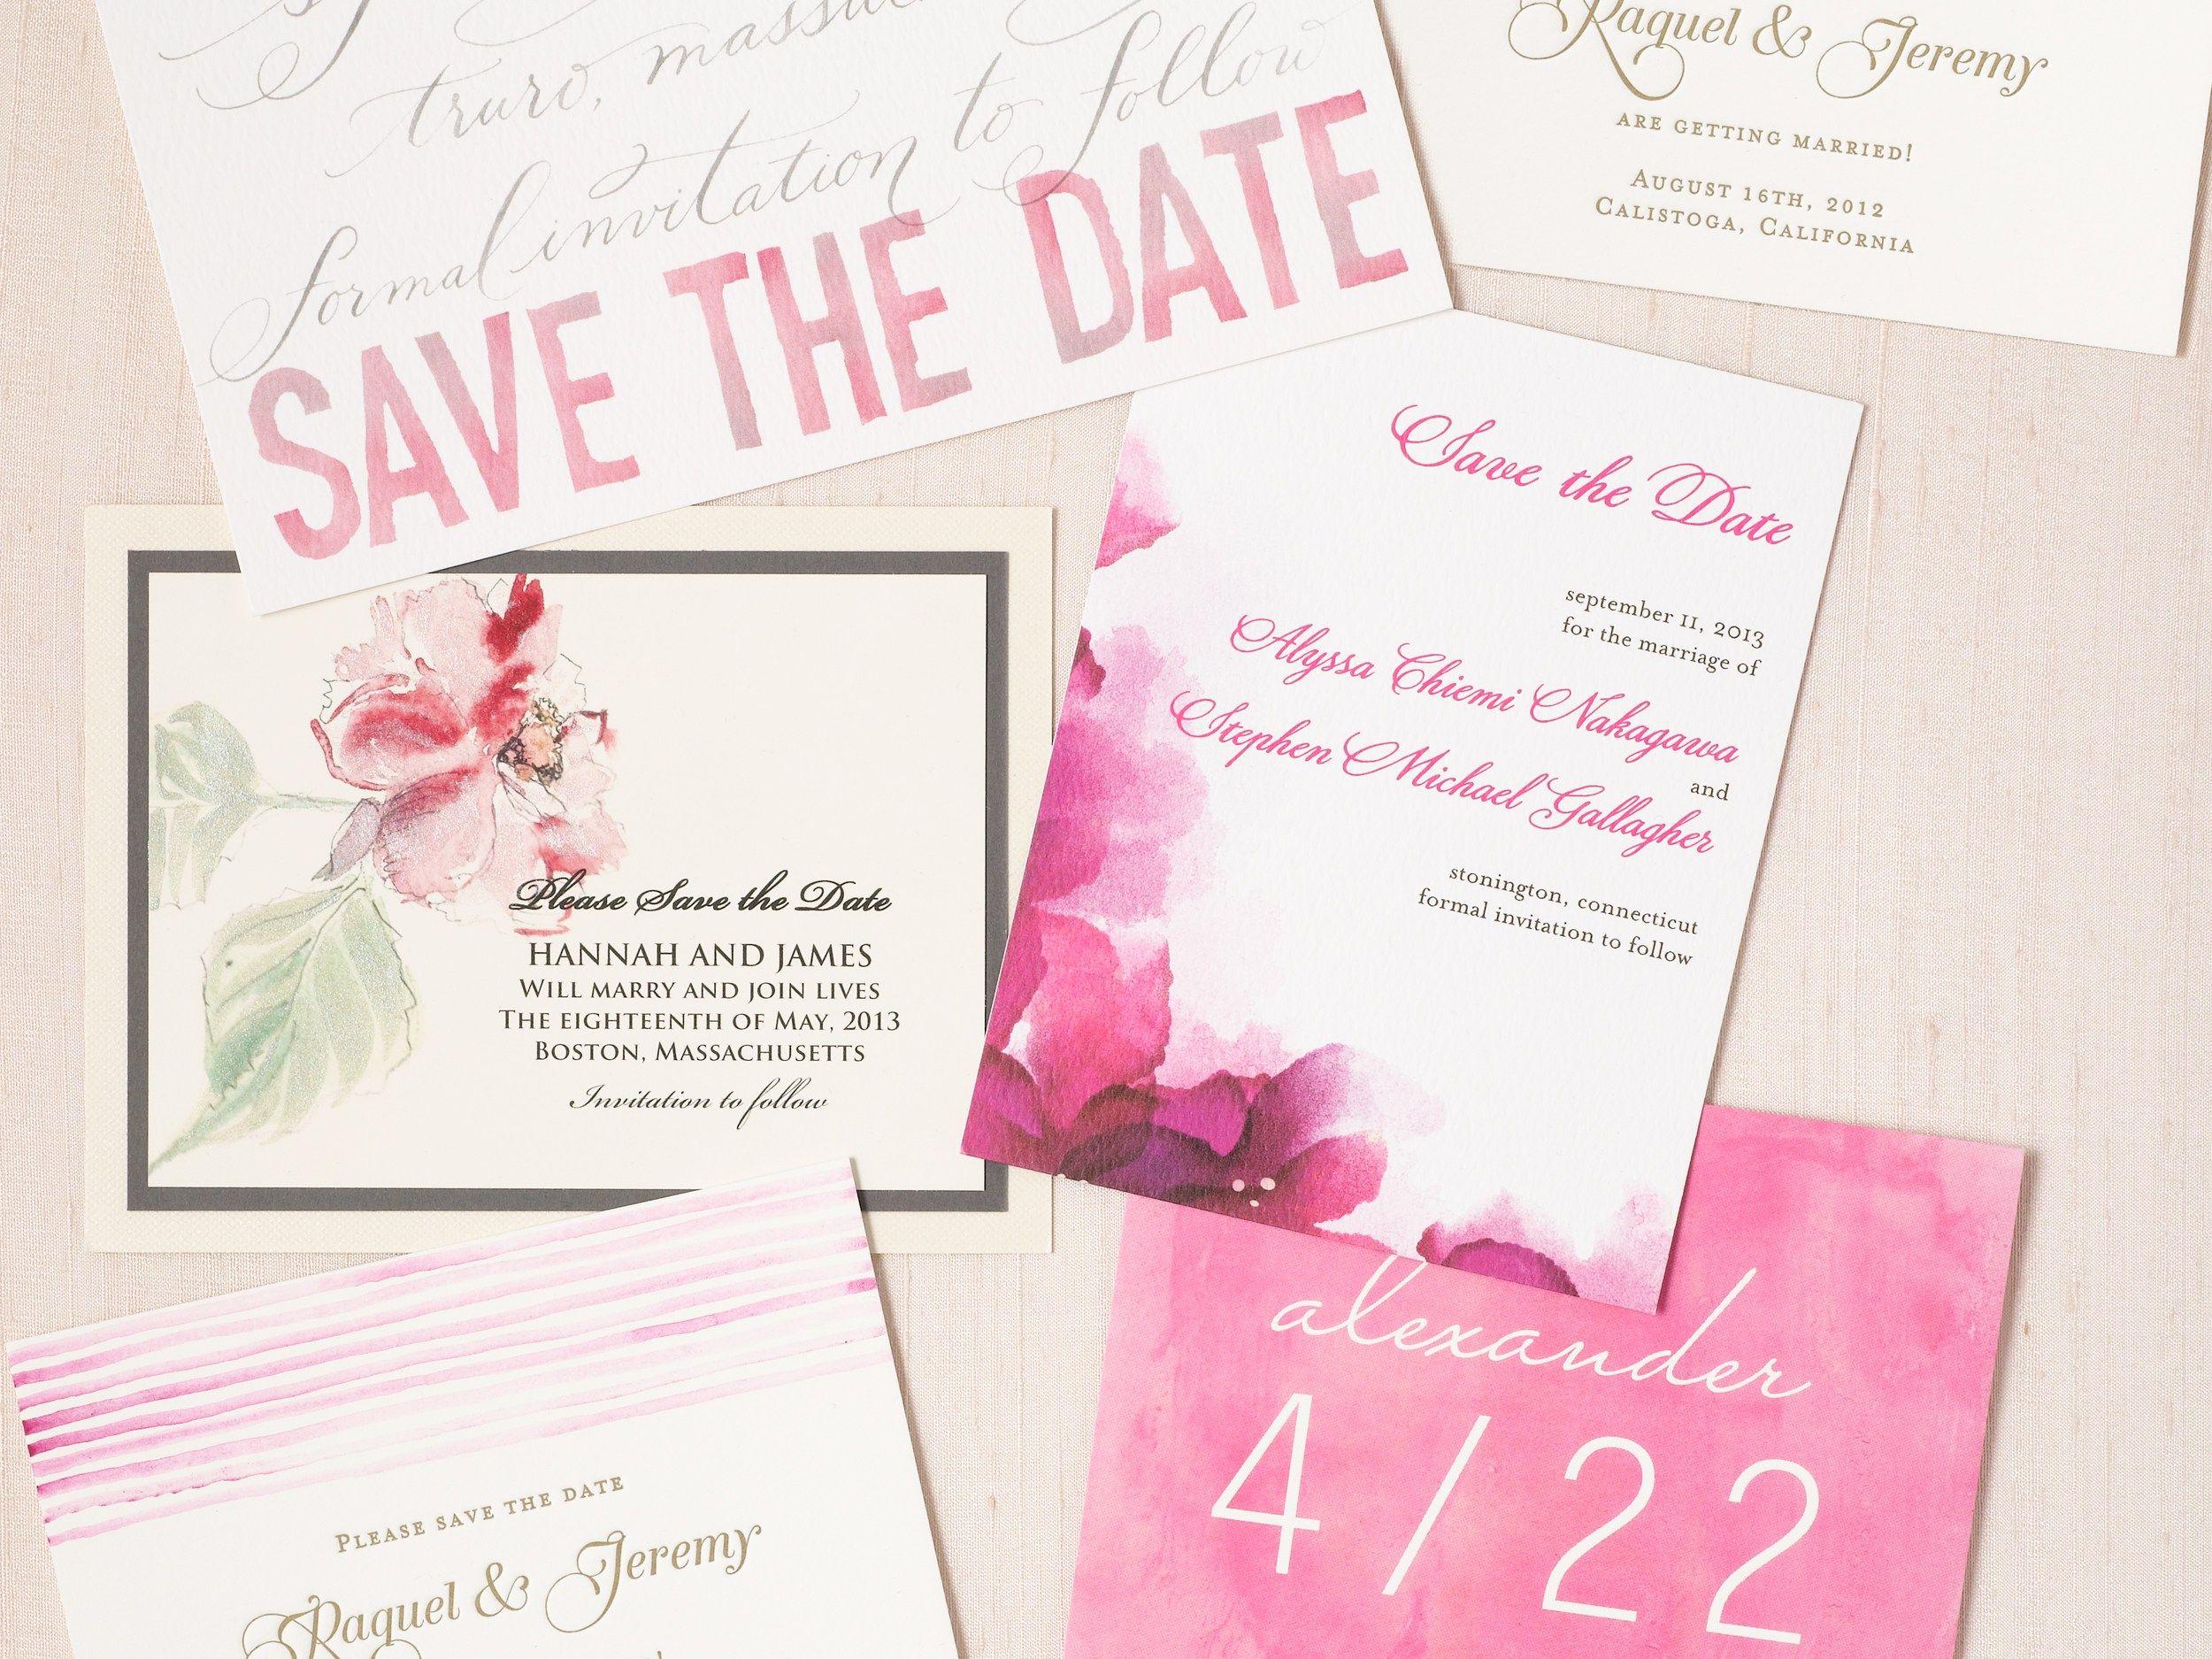 Wedding Invitation Response Card : Wedding Invitation Response Card ...